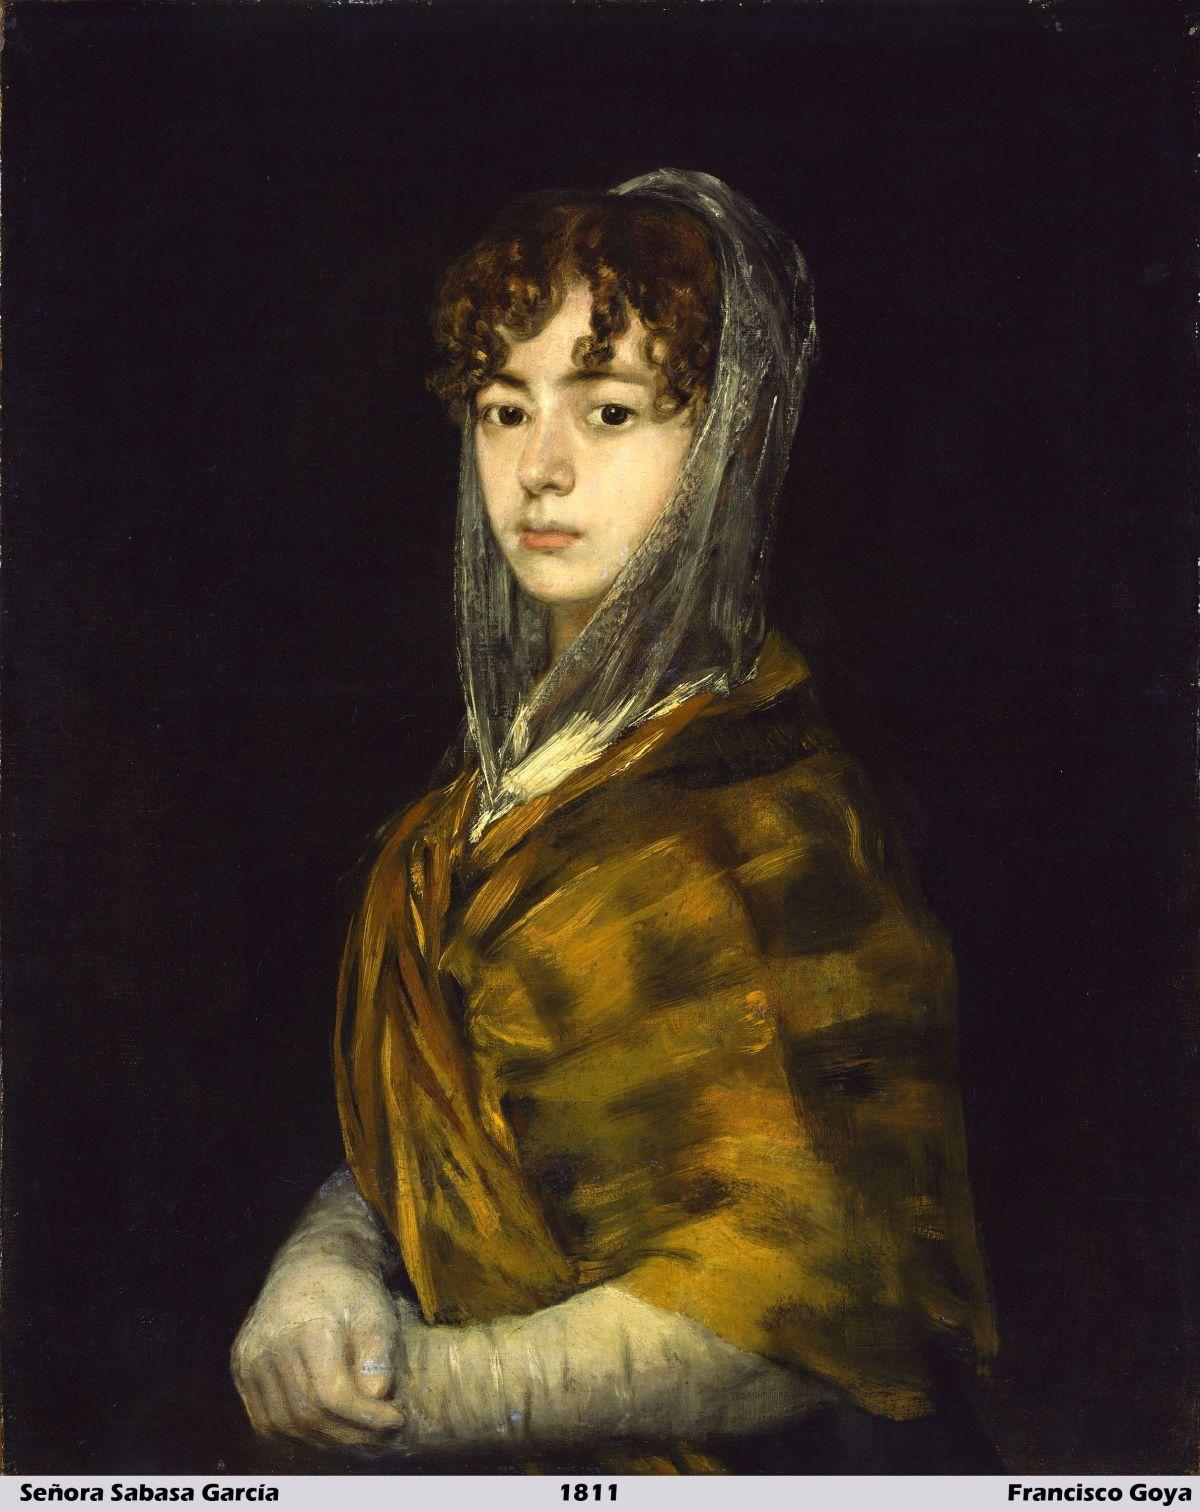 Senora Sabasa Garcia by Francisco Goya